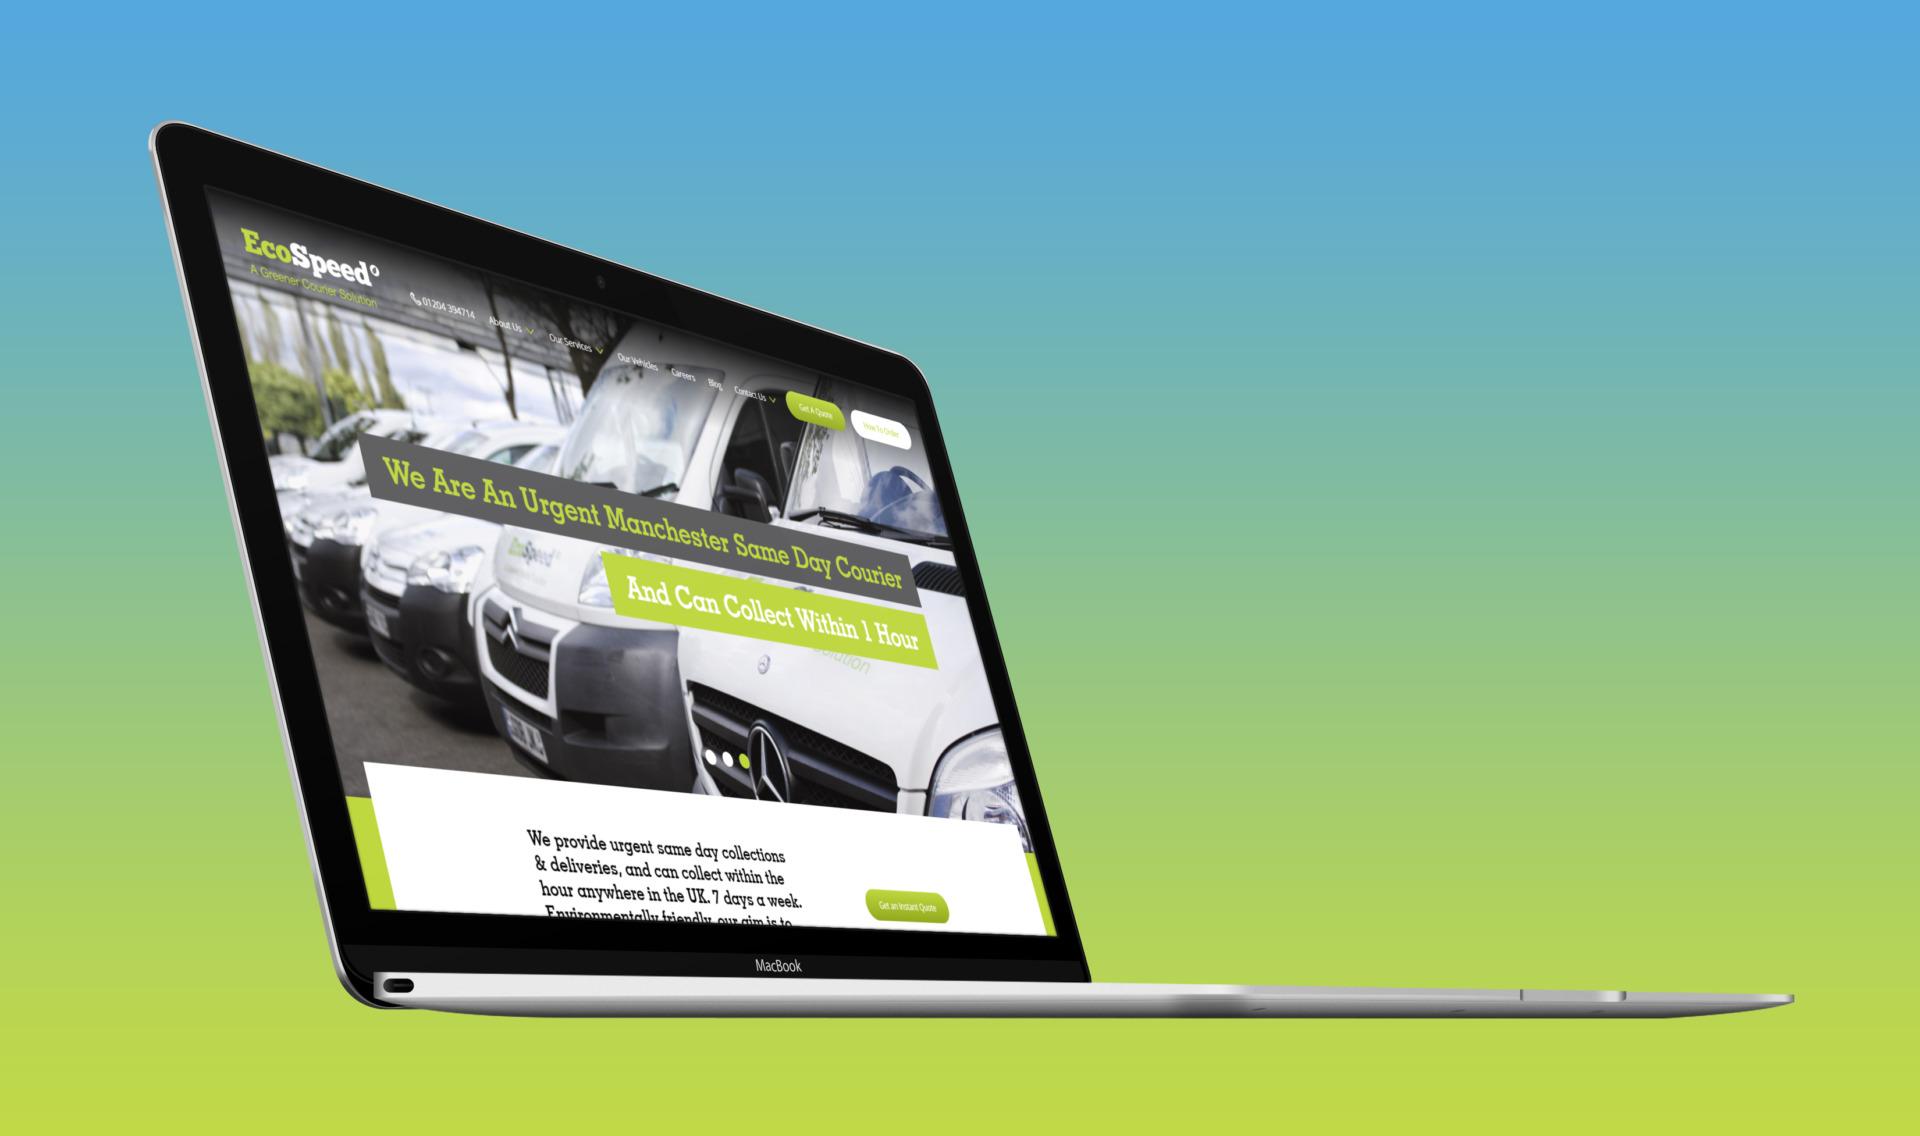 Ecospeed | Macbook Angled Device Mockup